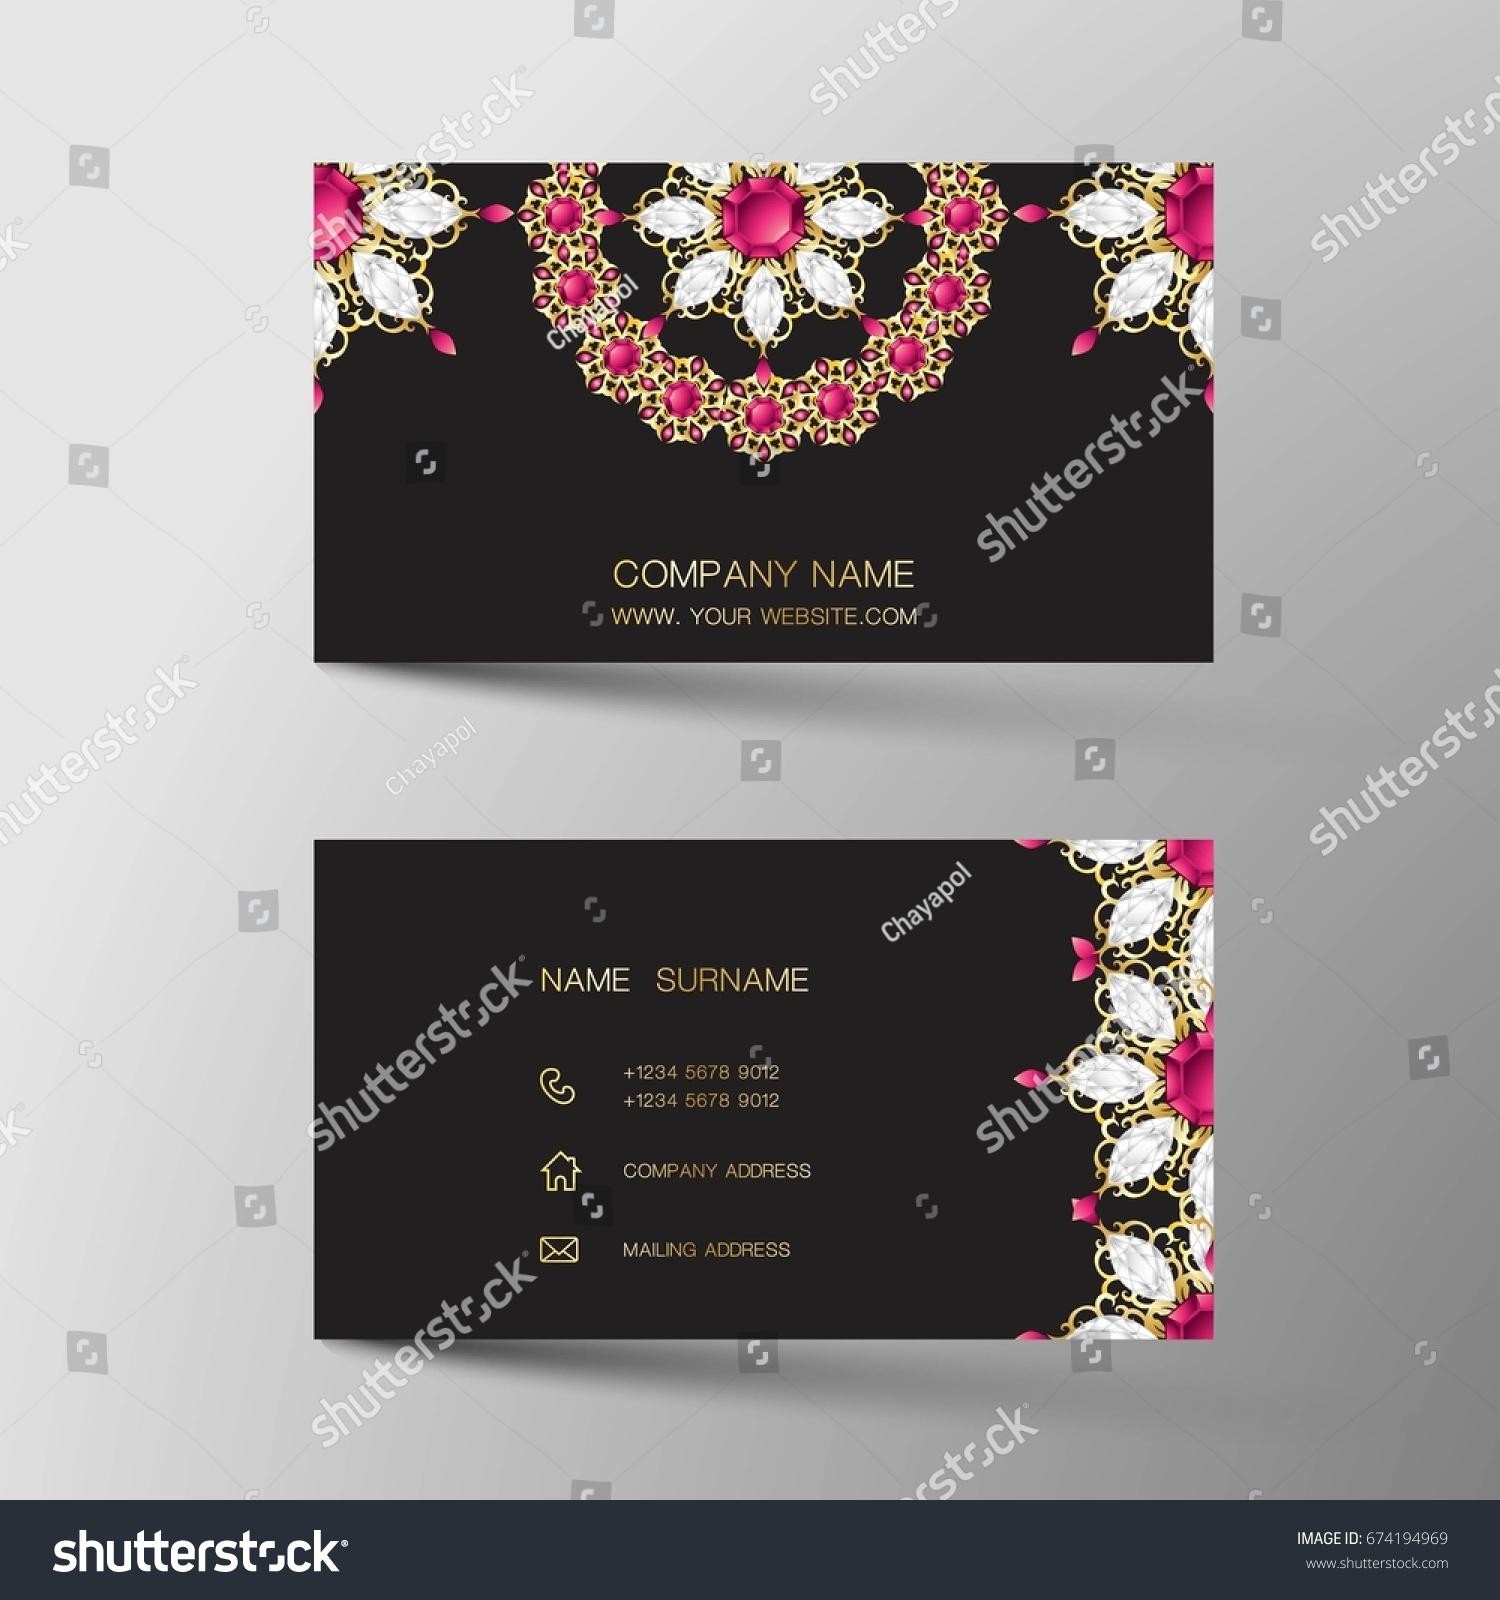 Luxurious indian business card diamond gem stock vector 674194969 luxurious indian business card diamond gem jewelry color magicingreecefo Choice Image